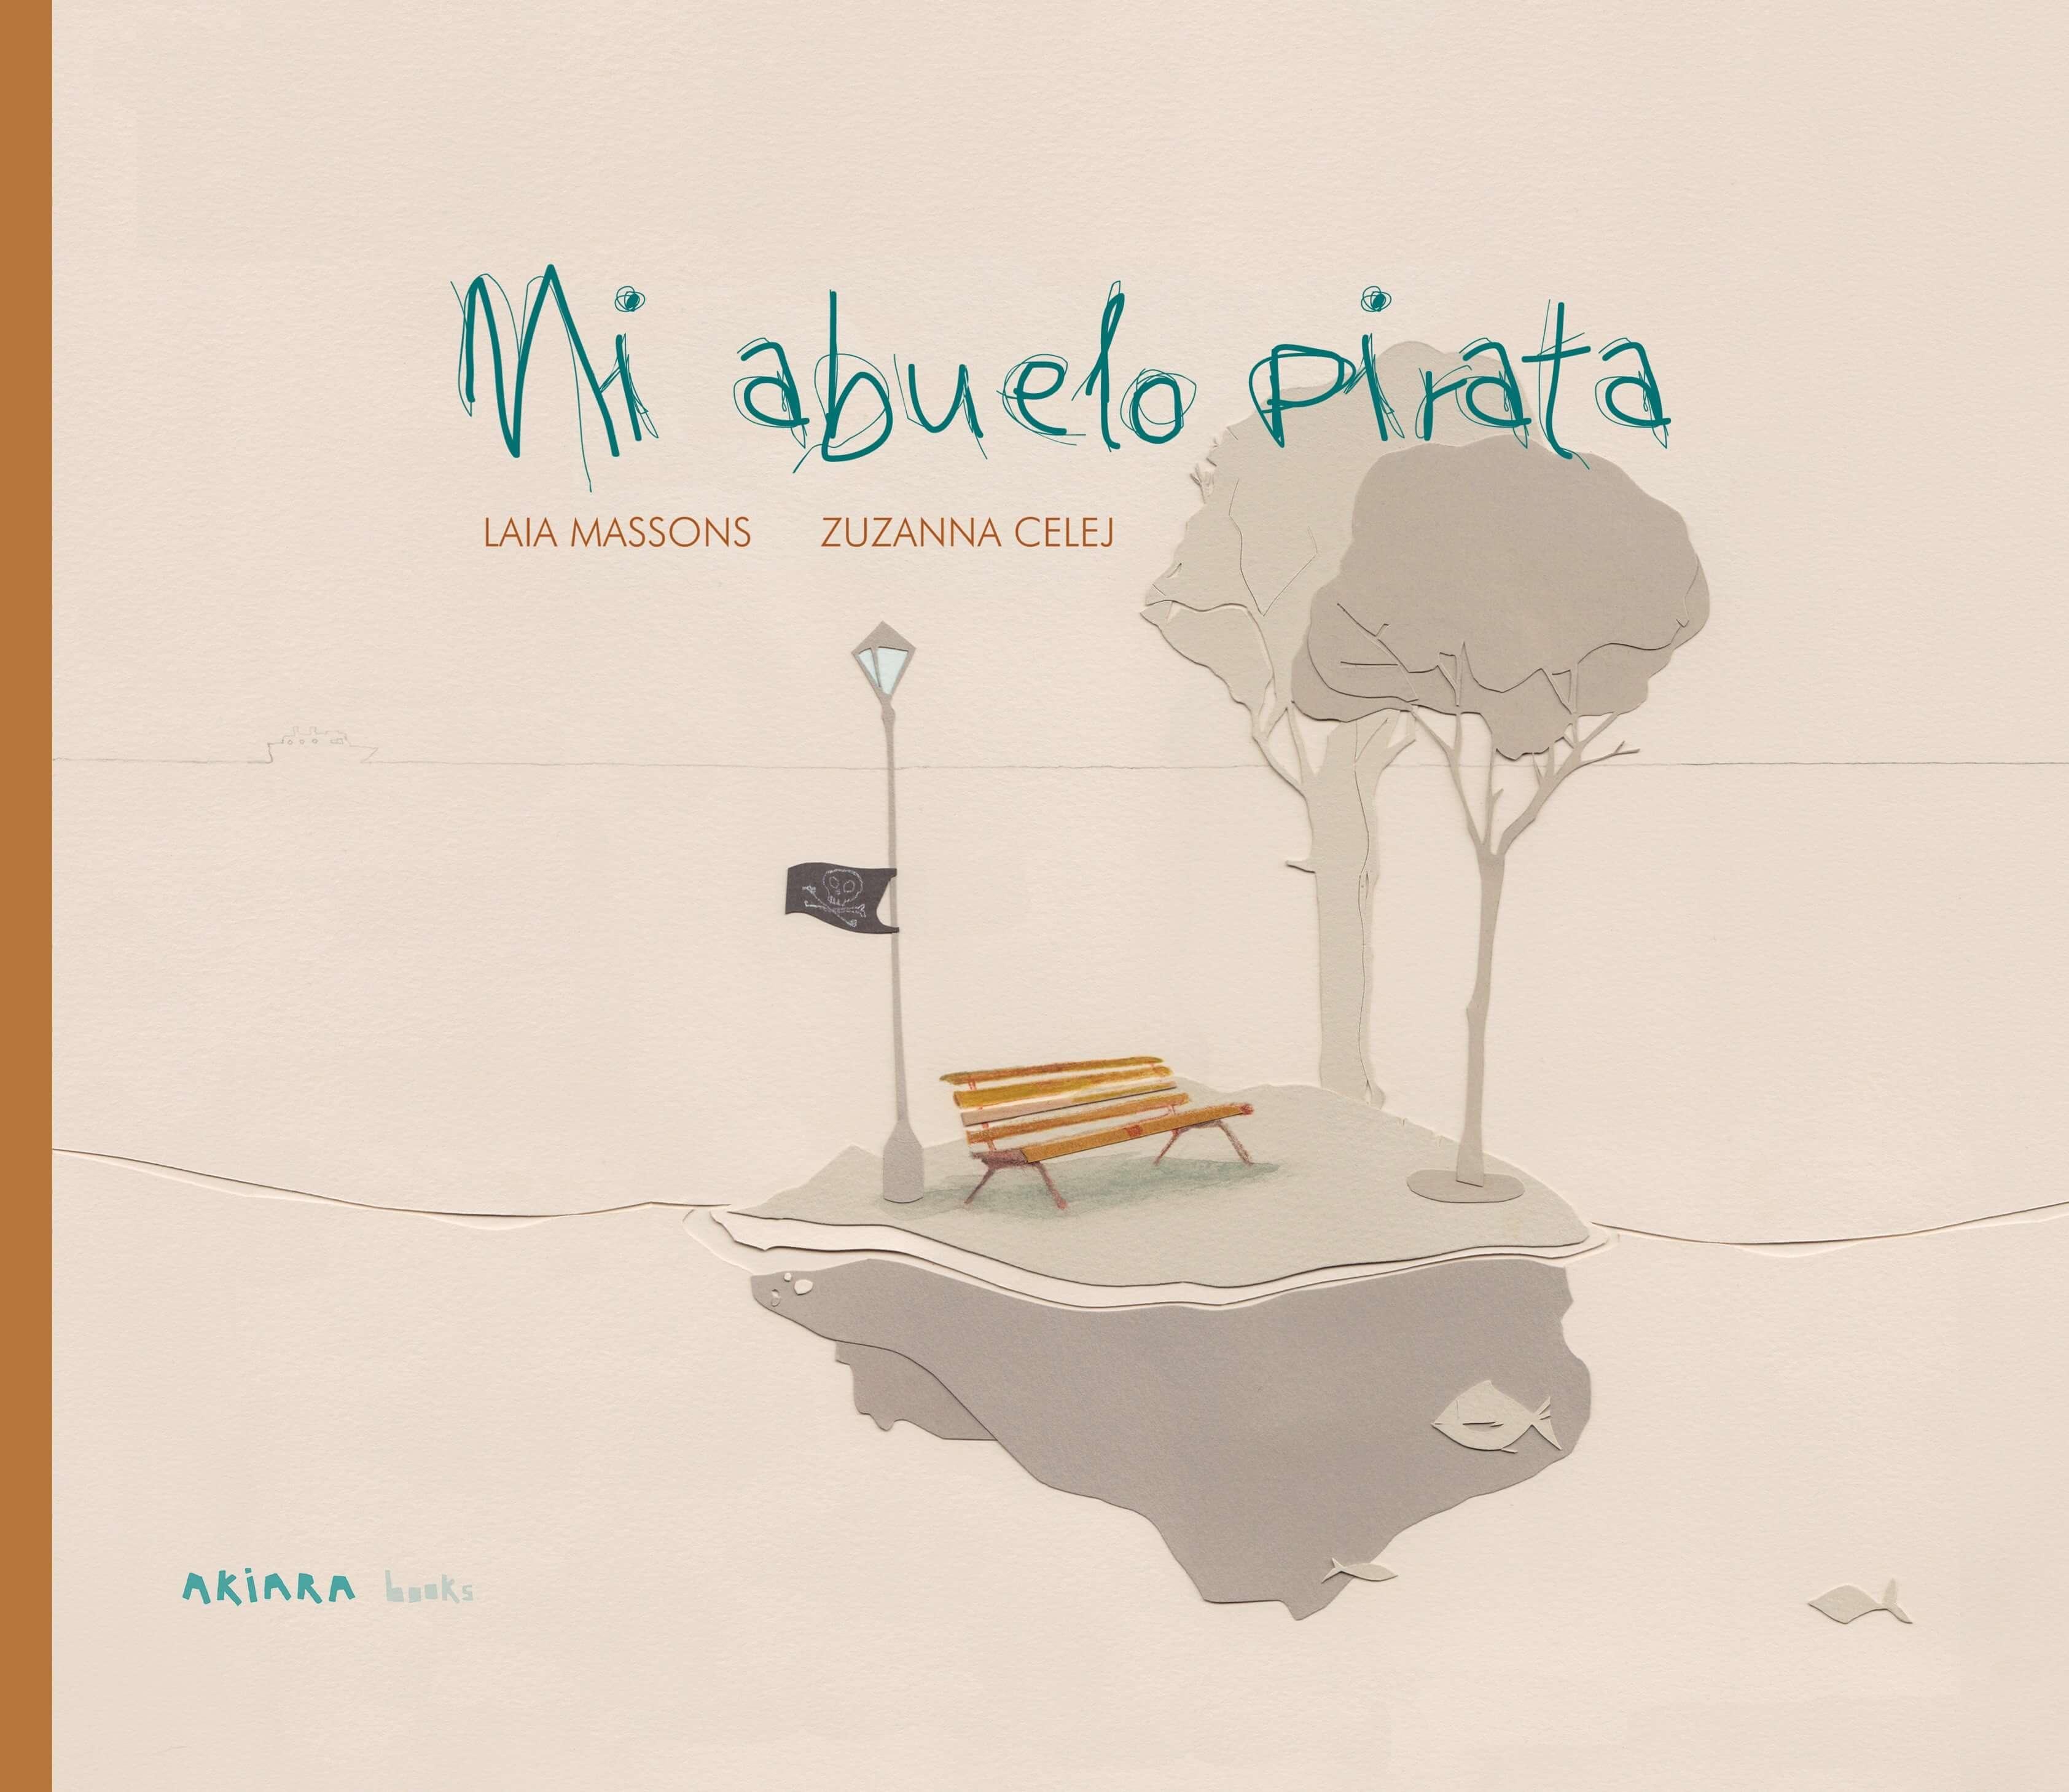 AKIARA MI ABUELA COVER